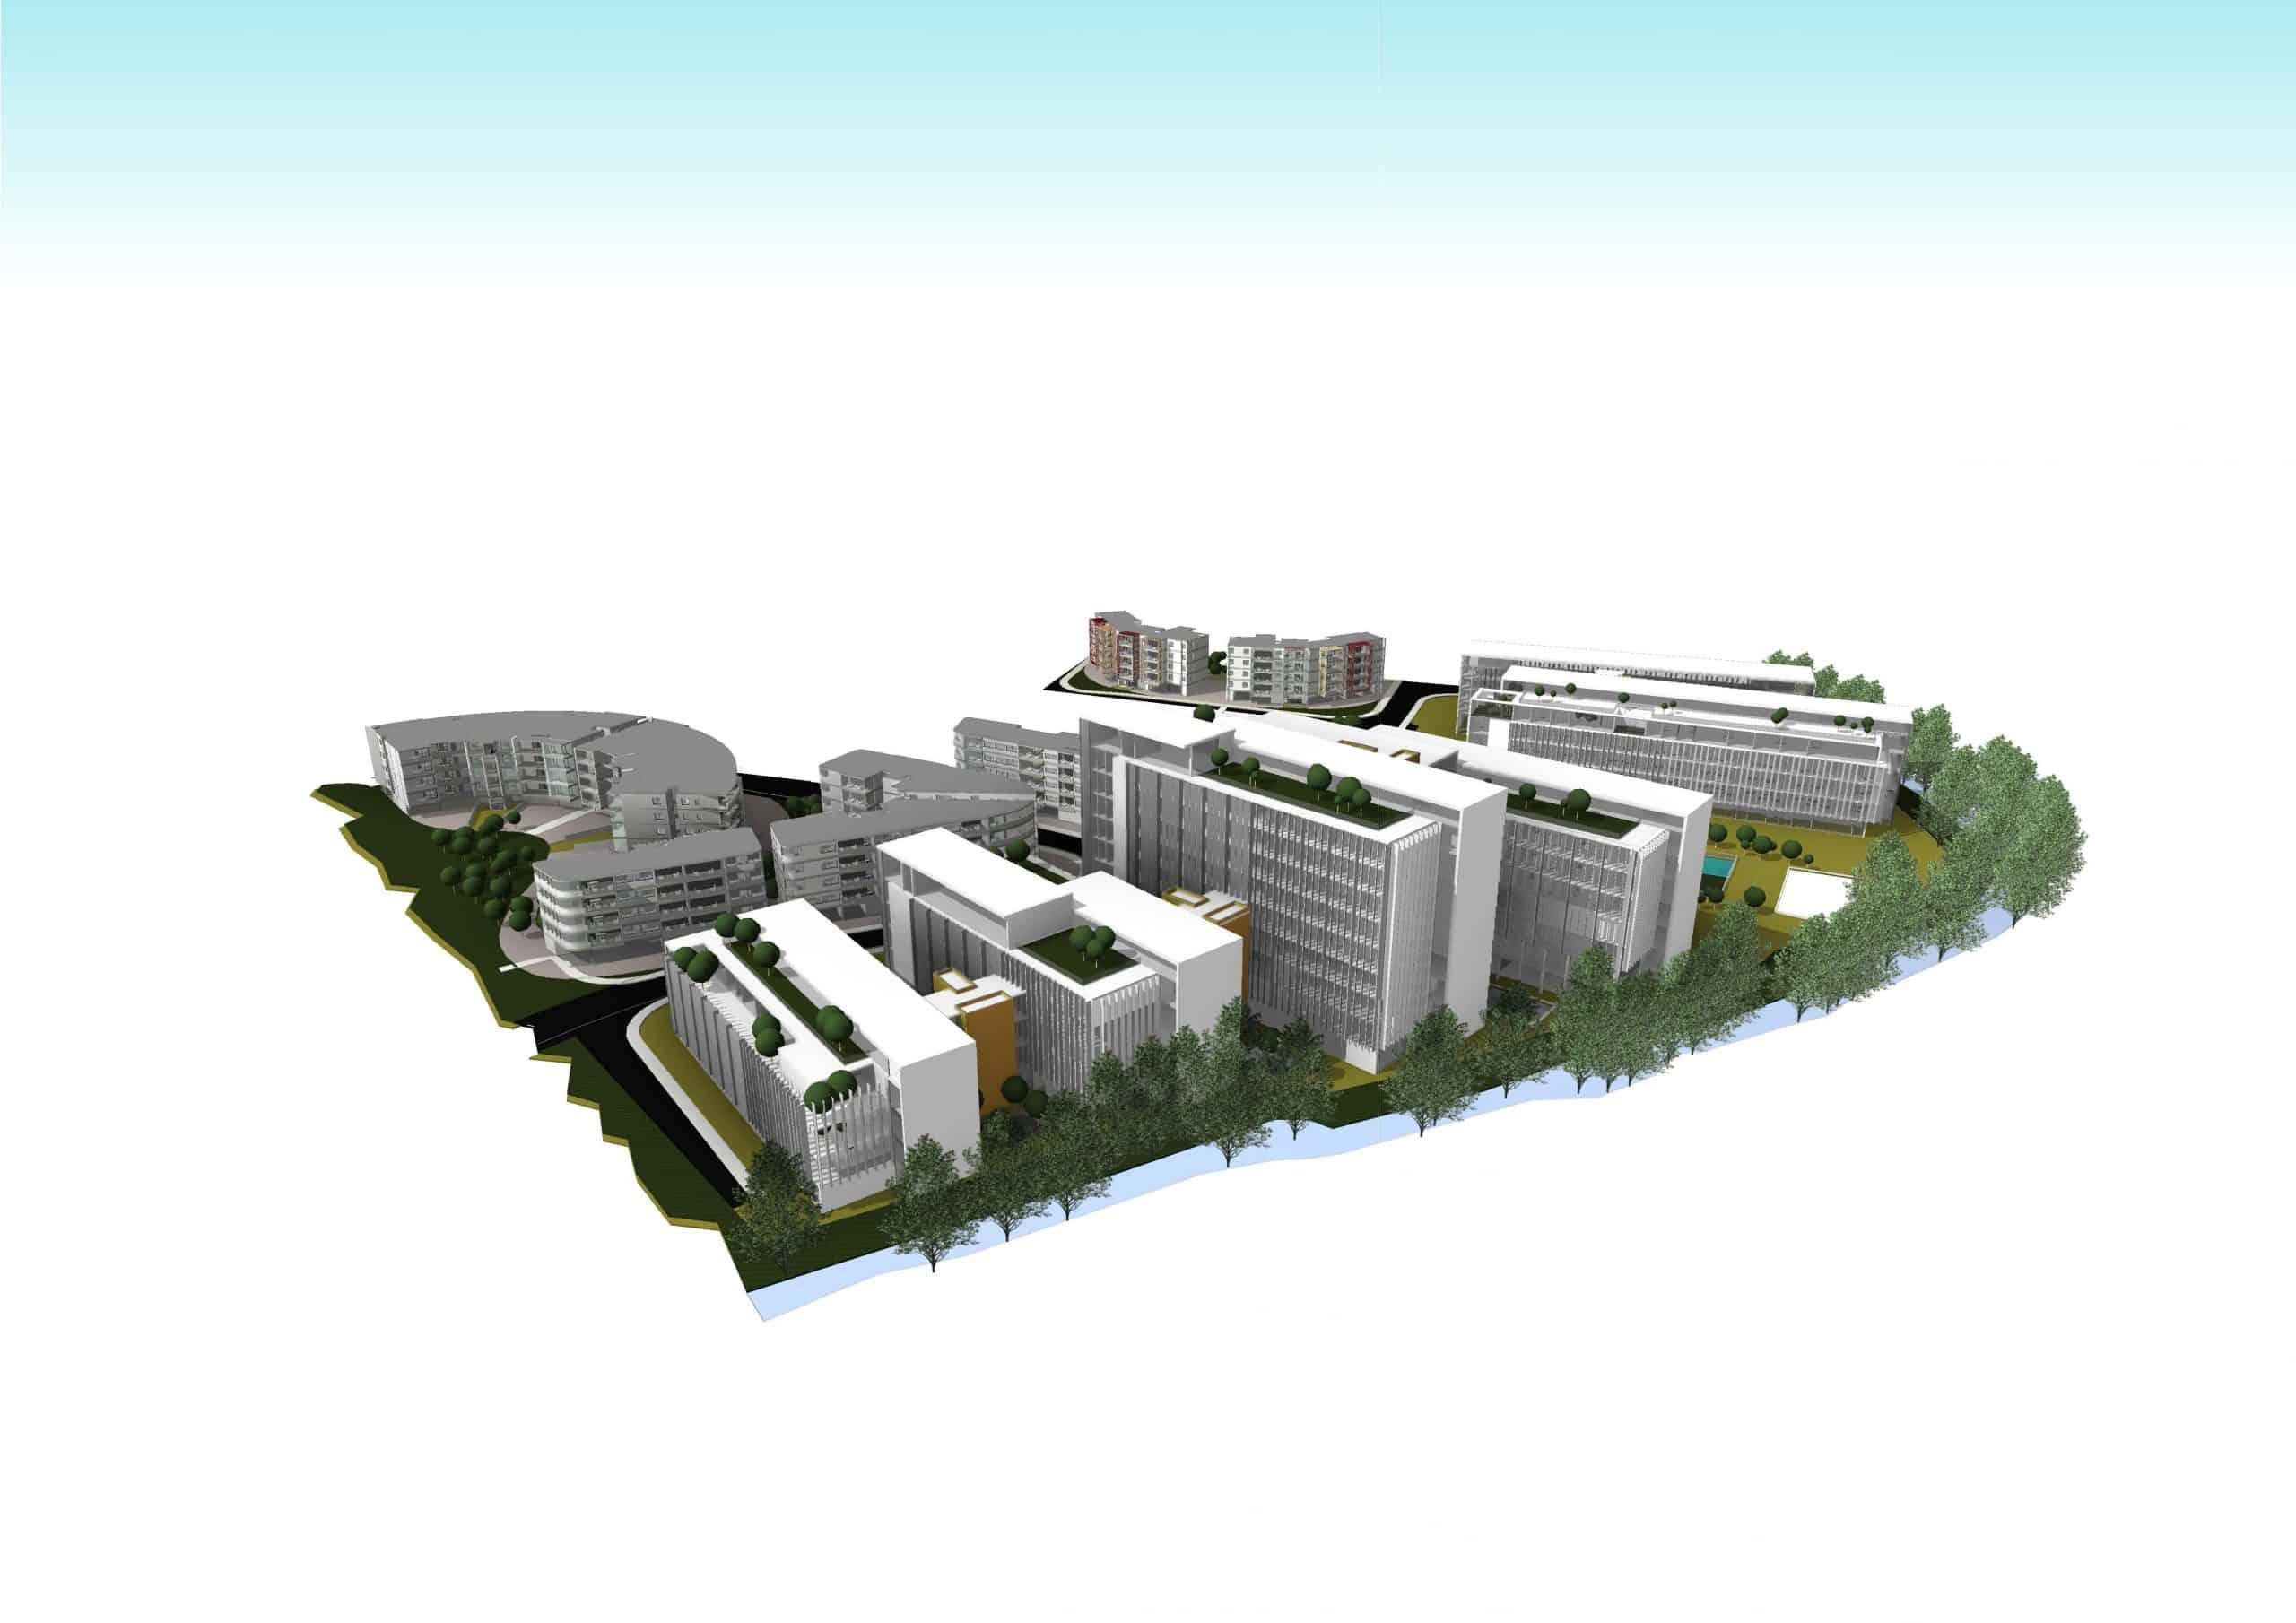 H.C. Management of Medical Center - Appendix 1 scaled